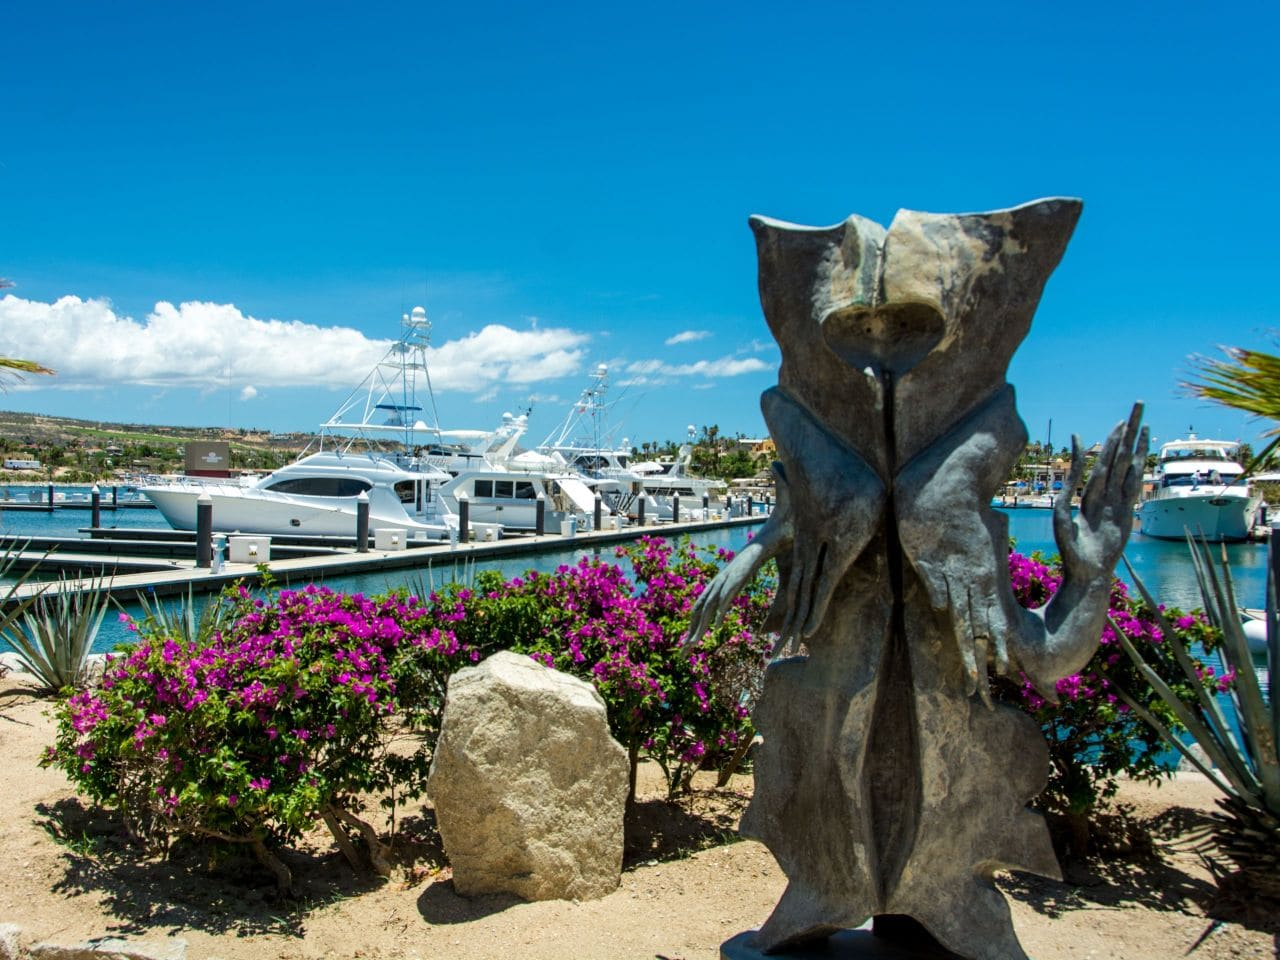 San Jose del Cabo Marina